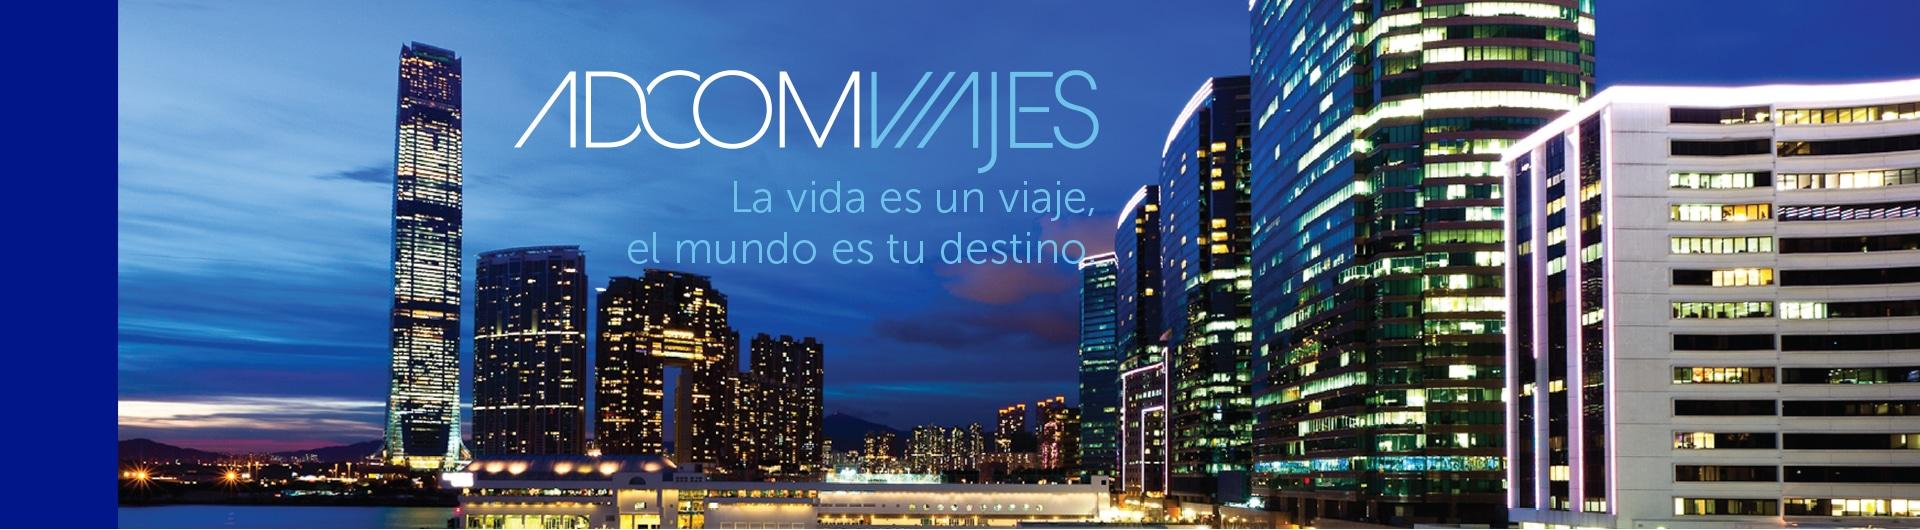 Adcom Viajes Diseño Corporativo